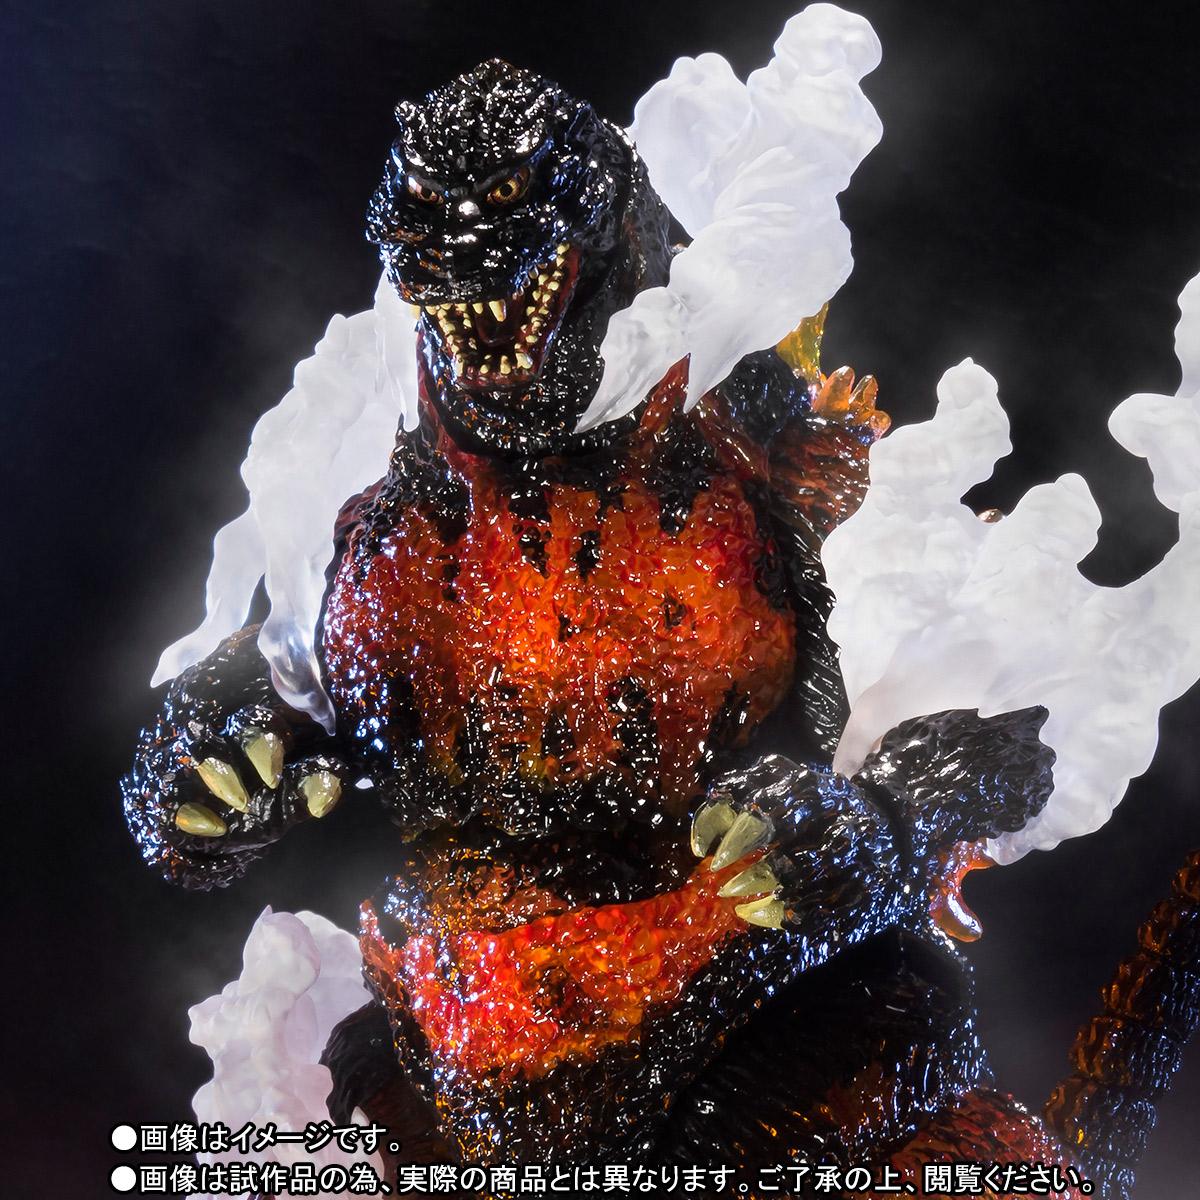 S.H.MonsterArts Ultimate Burning Godzilla 1995 Figure